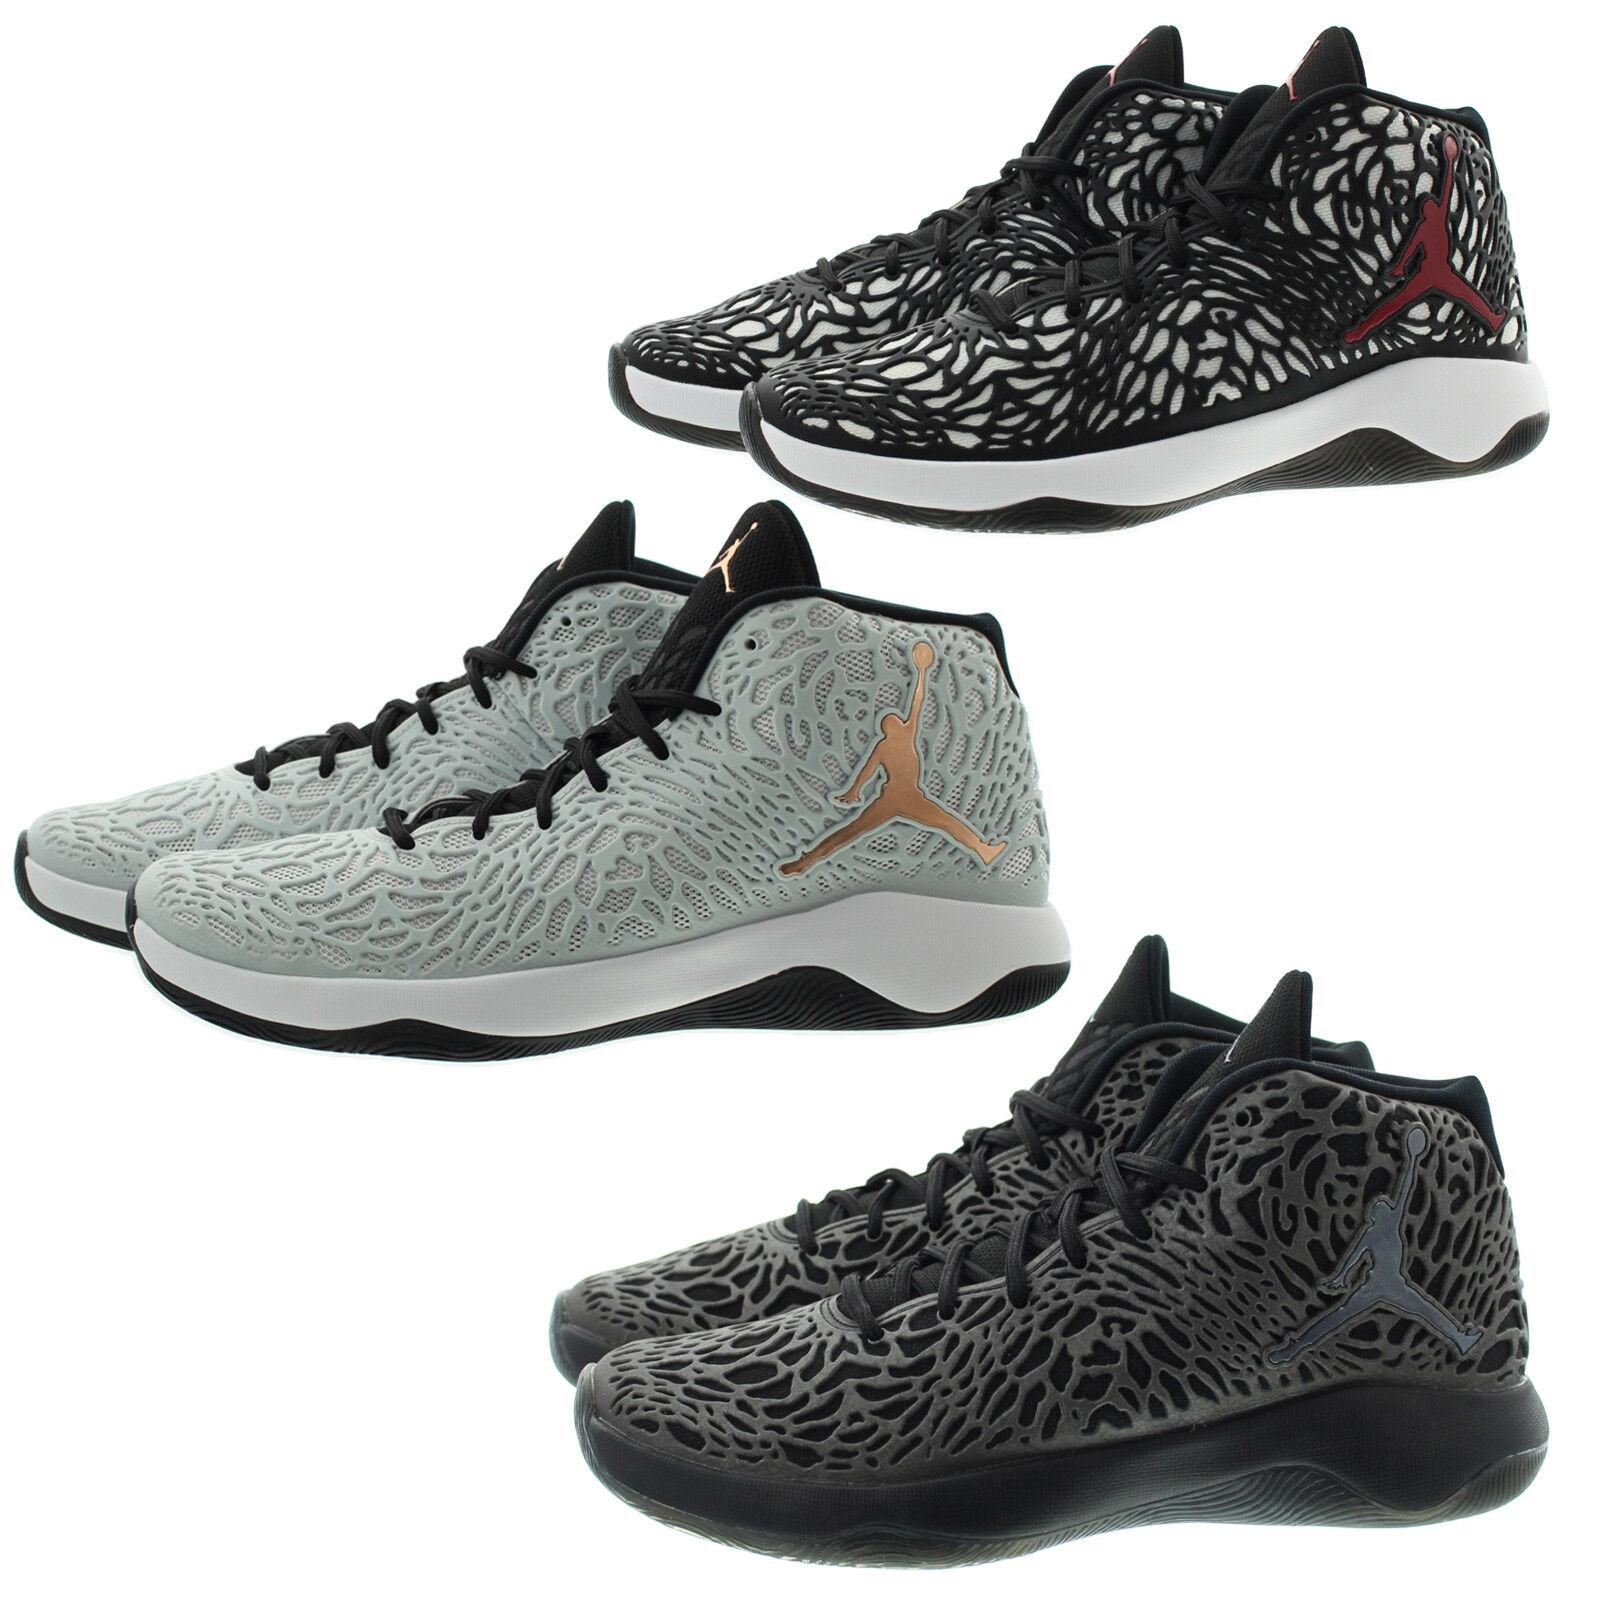 Nike 834268 Uomo Air Jordan Ultra Fly Lightweight Basketball Shoes Scarpe da Ginnastica